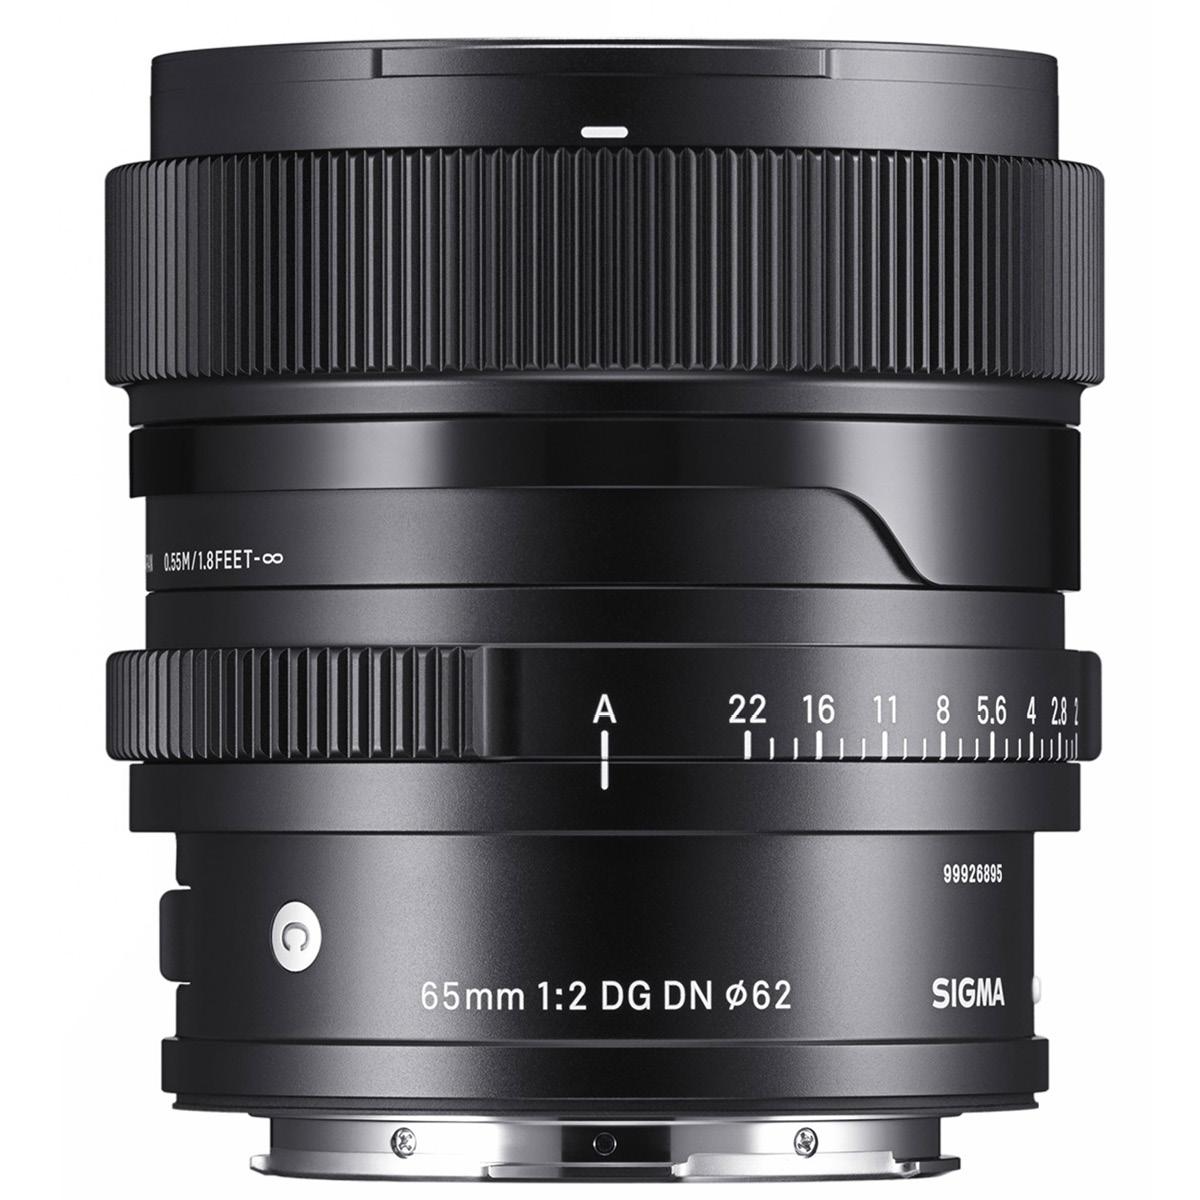 Sigma 65 mm 1:2,0 DG DN (C) L-Mount